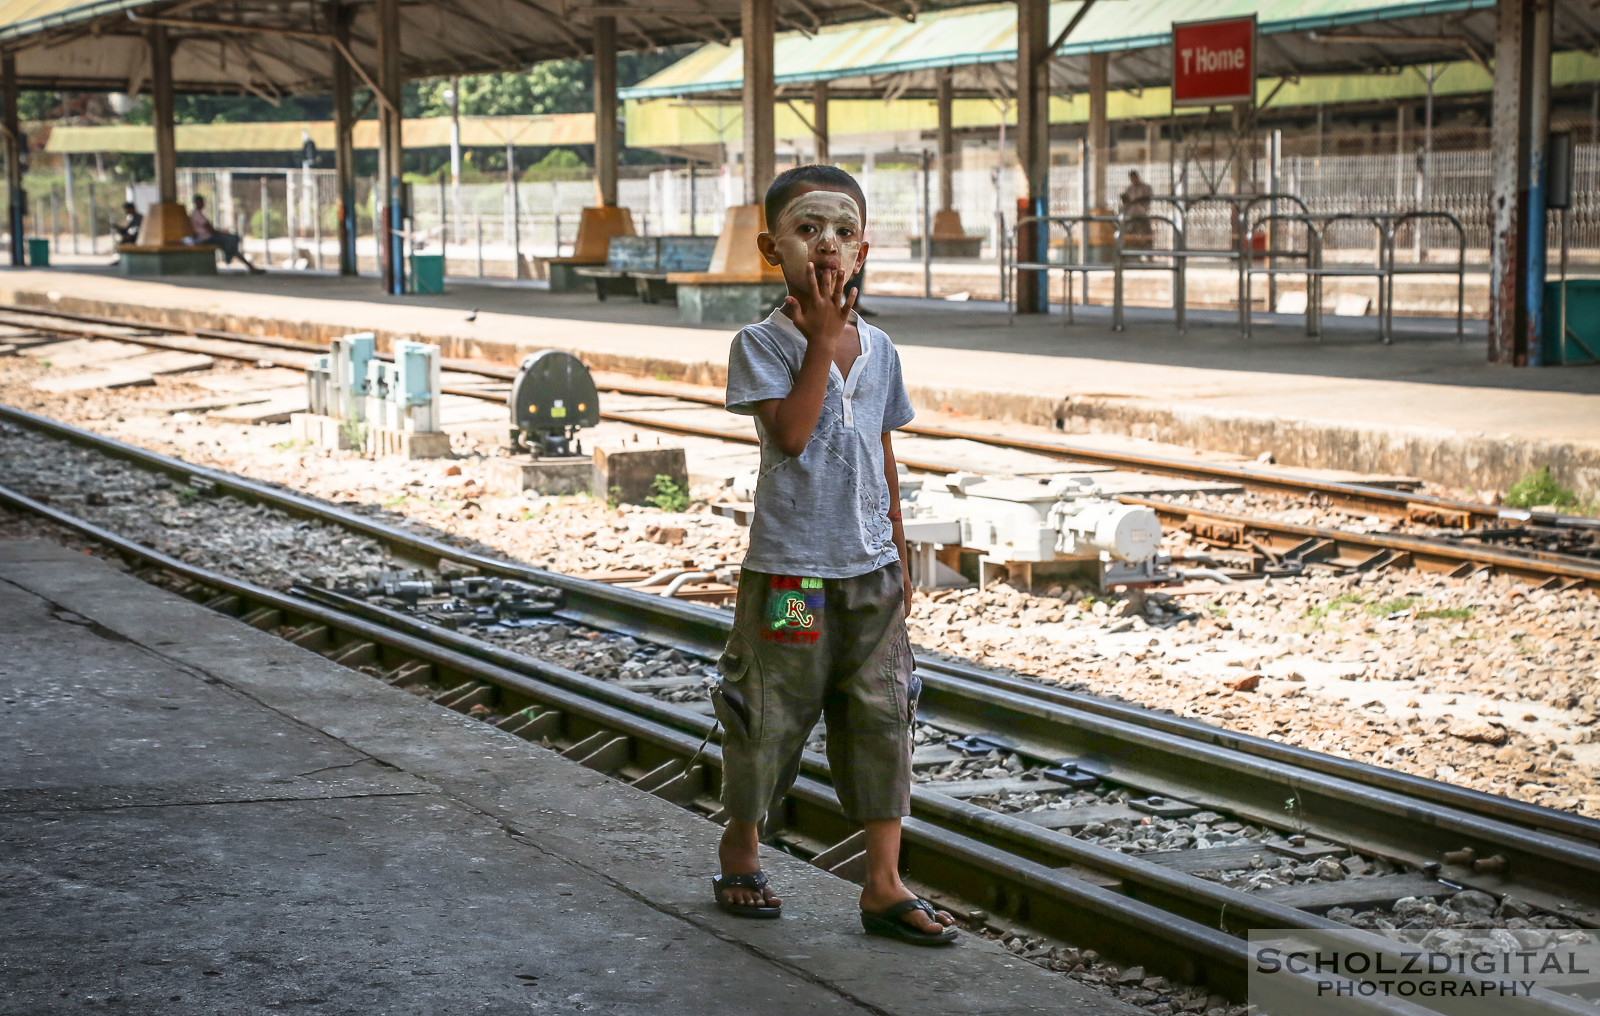 Exploring, Travelling, Myanmar, Birma, Burma, Streetphotography, Travelling, Wanderlust, Southeastasia, asia, travel, globetrotter, travelphotography, Yangon, Rangun, Junge auf Bahnsteig